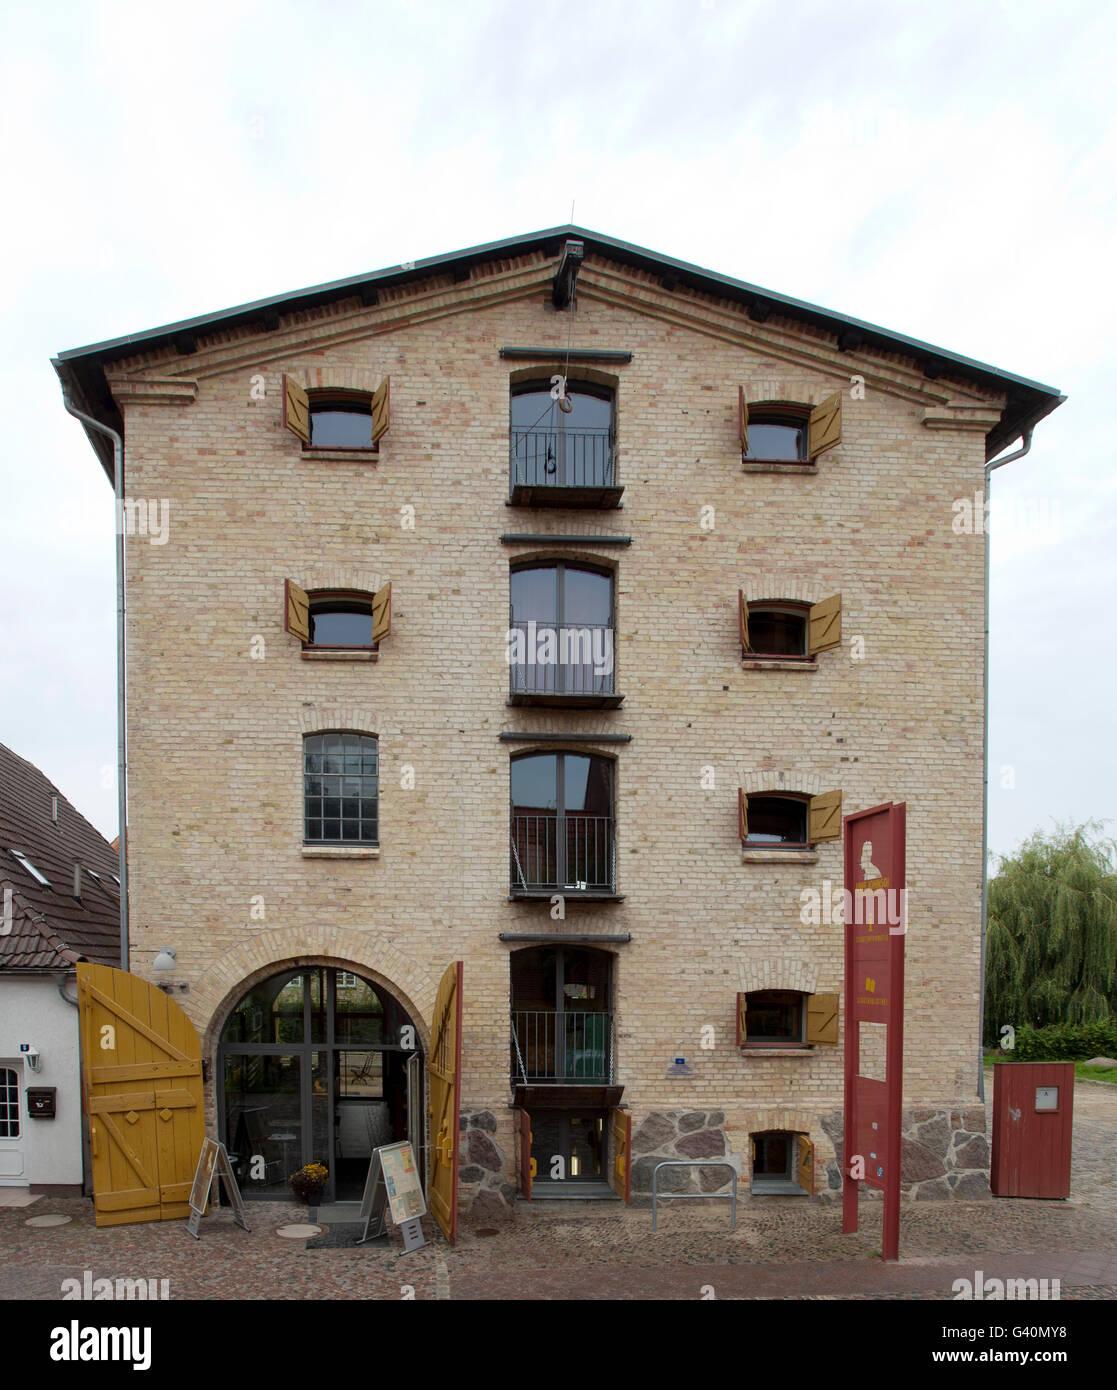 Uwe Johnson literature house, Kluetz, Mecklenburg-Western Pomerania - Stock Image